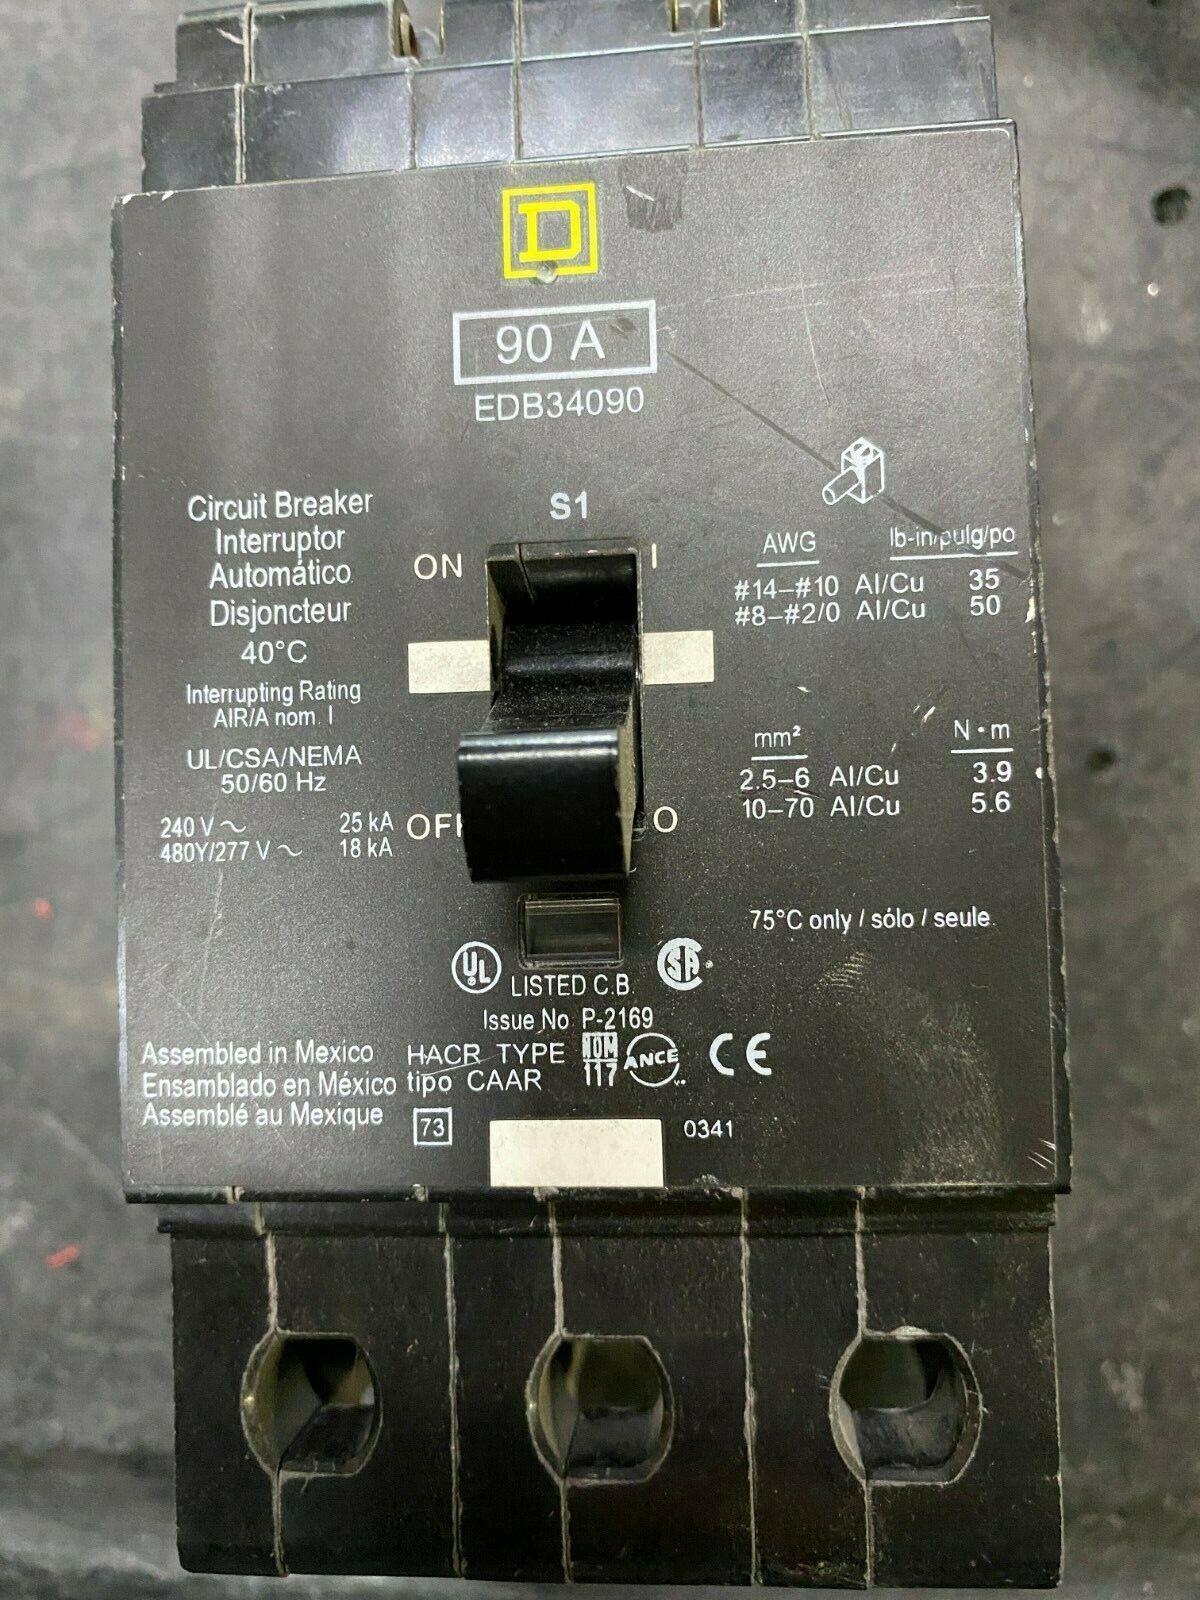 TESTED Square D EDB34090 90A 3 Pole 480Y//277V Circuit Breaker